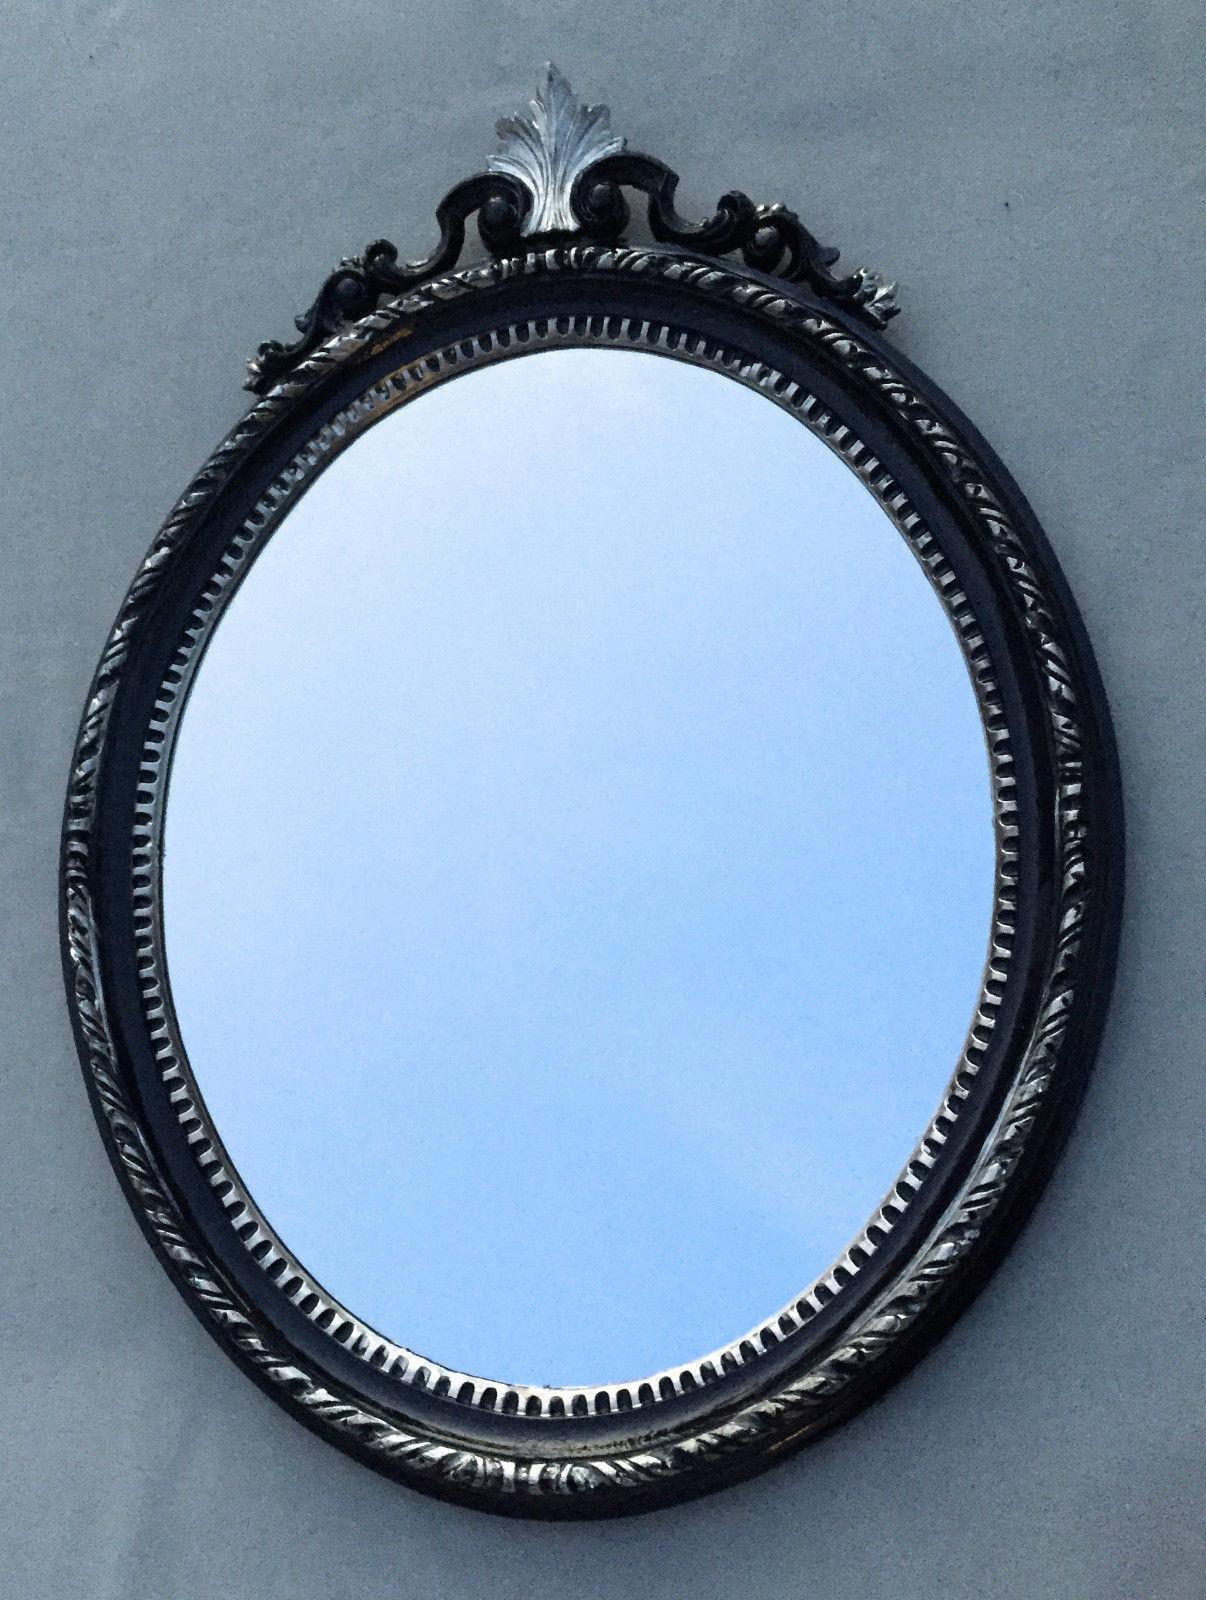 Wandspiegel Oval Antik Schwarz Silber Barock Spiegel 51X37 Mirror ...